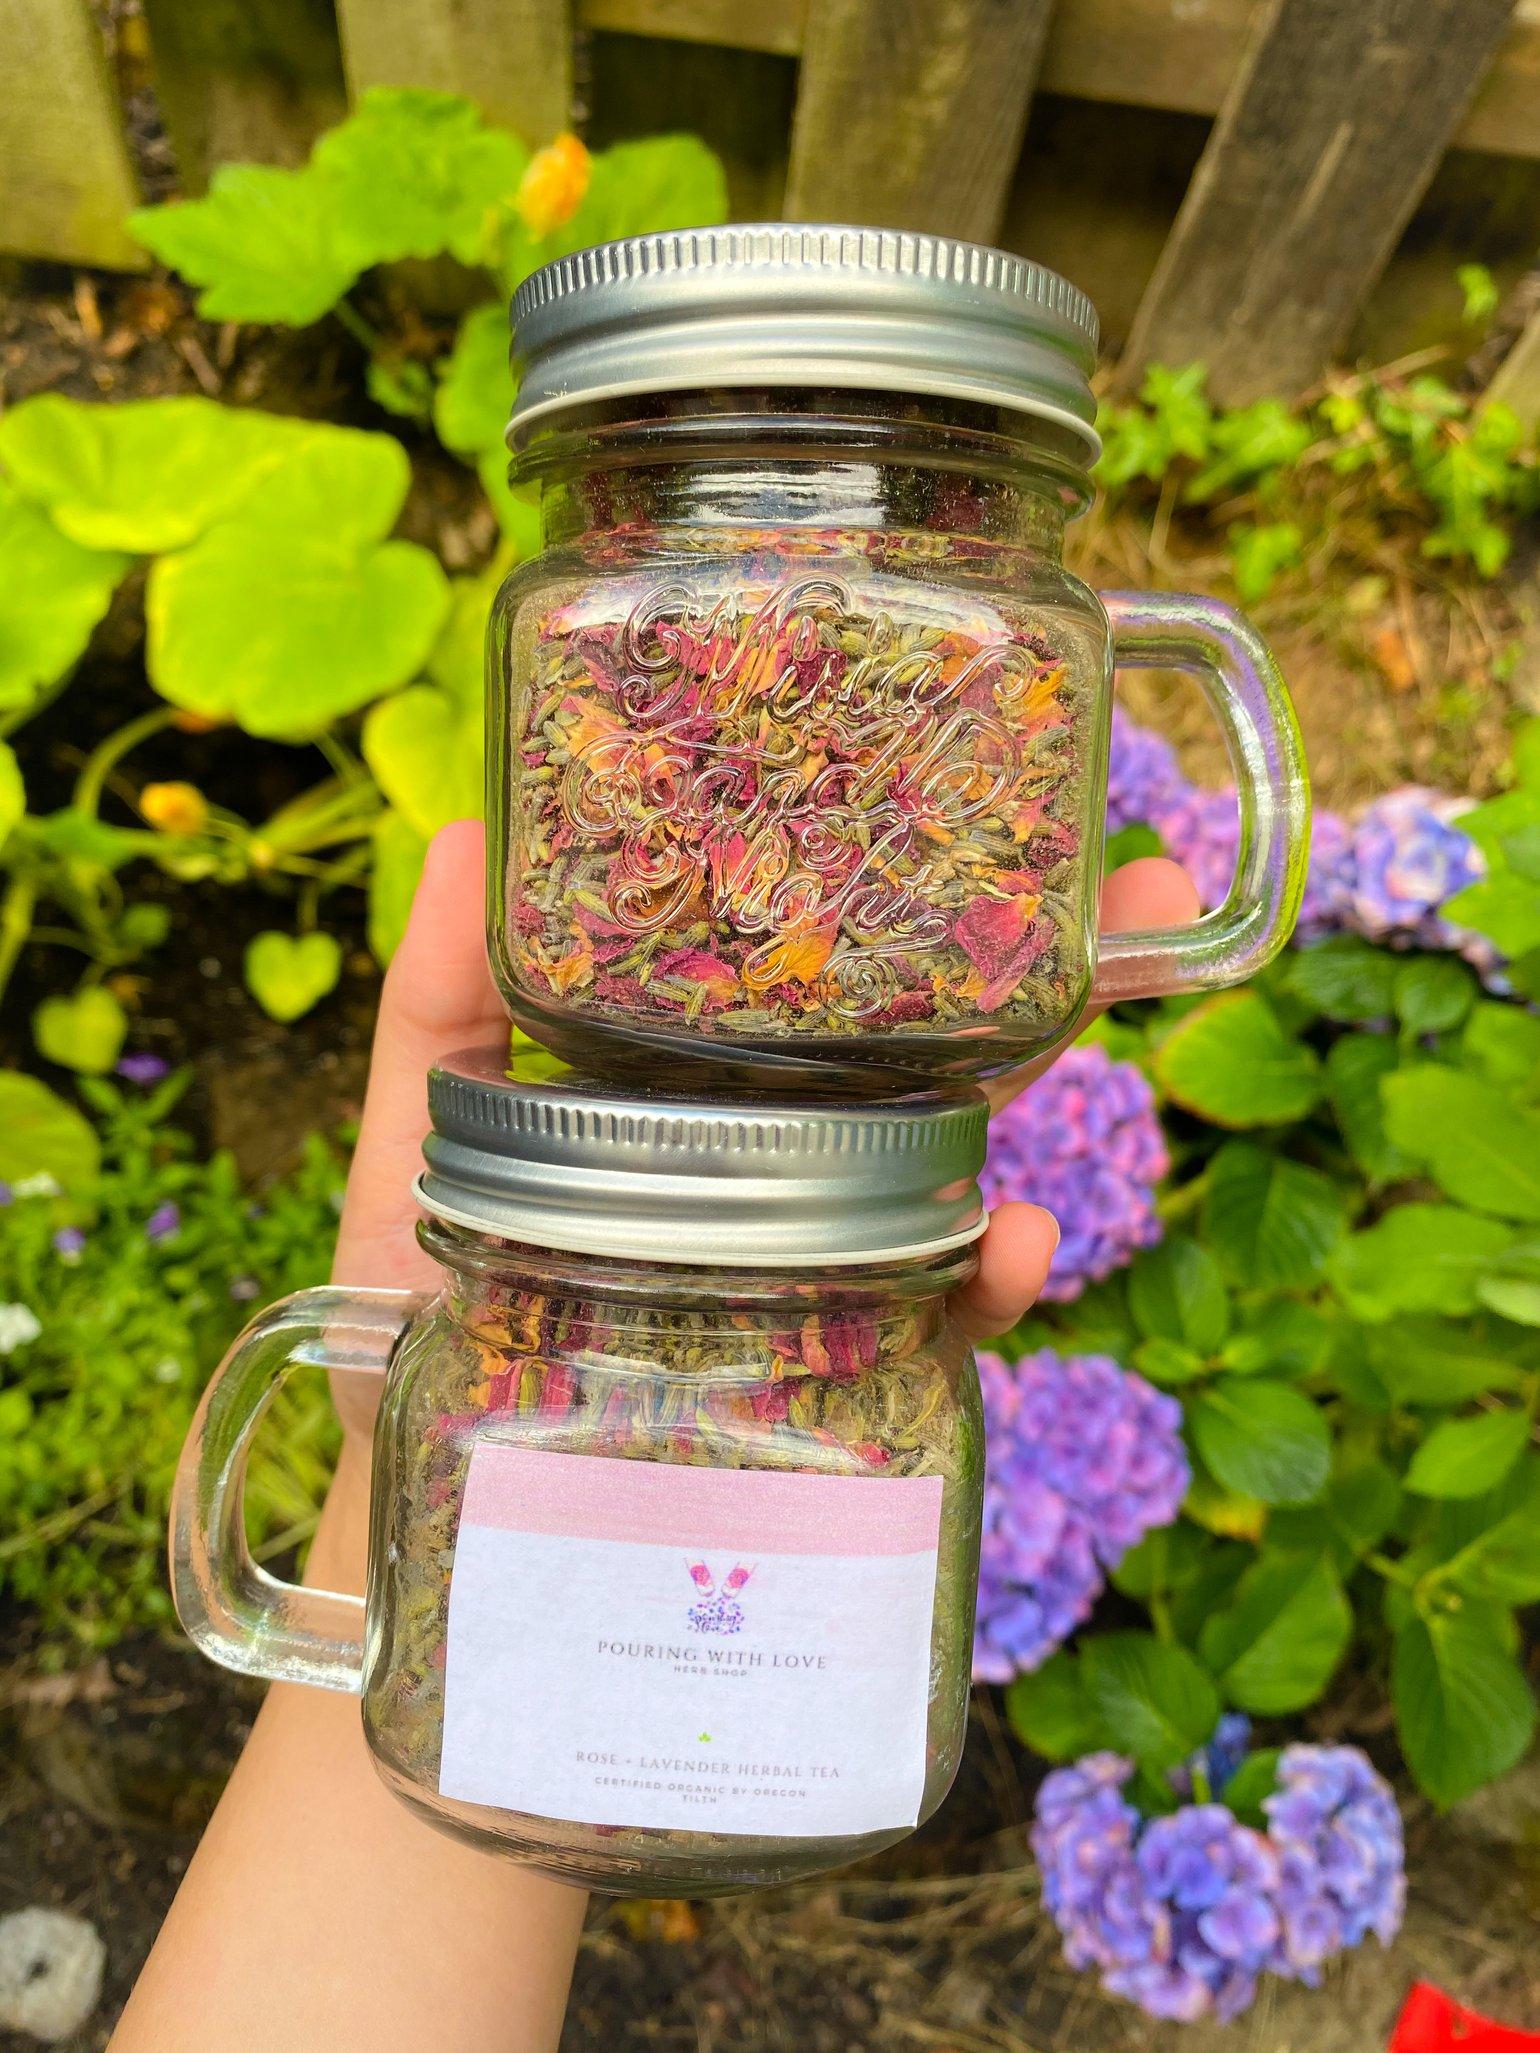 Image of rose + lavender herbal tea